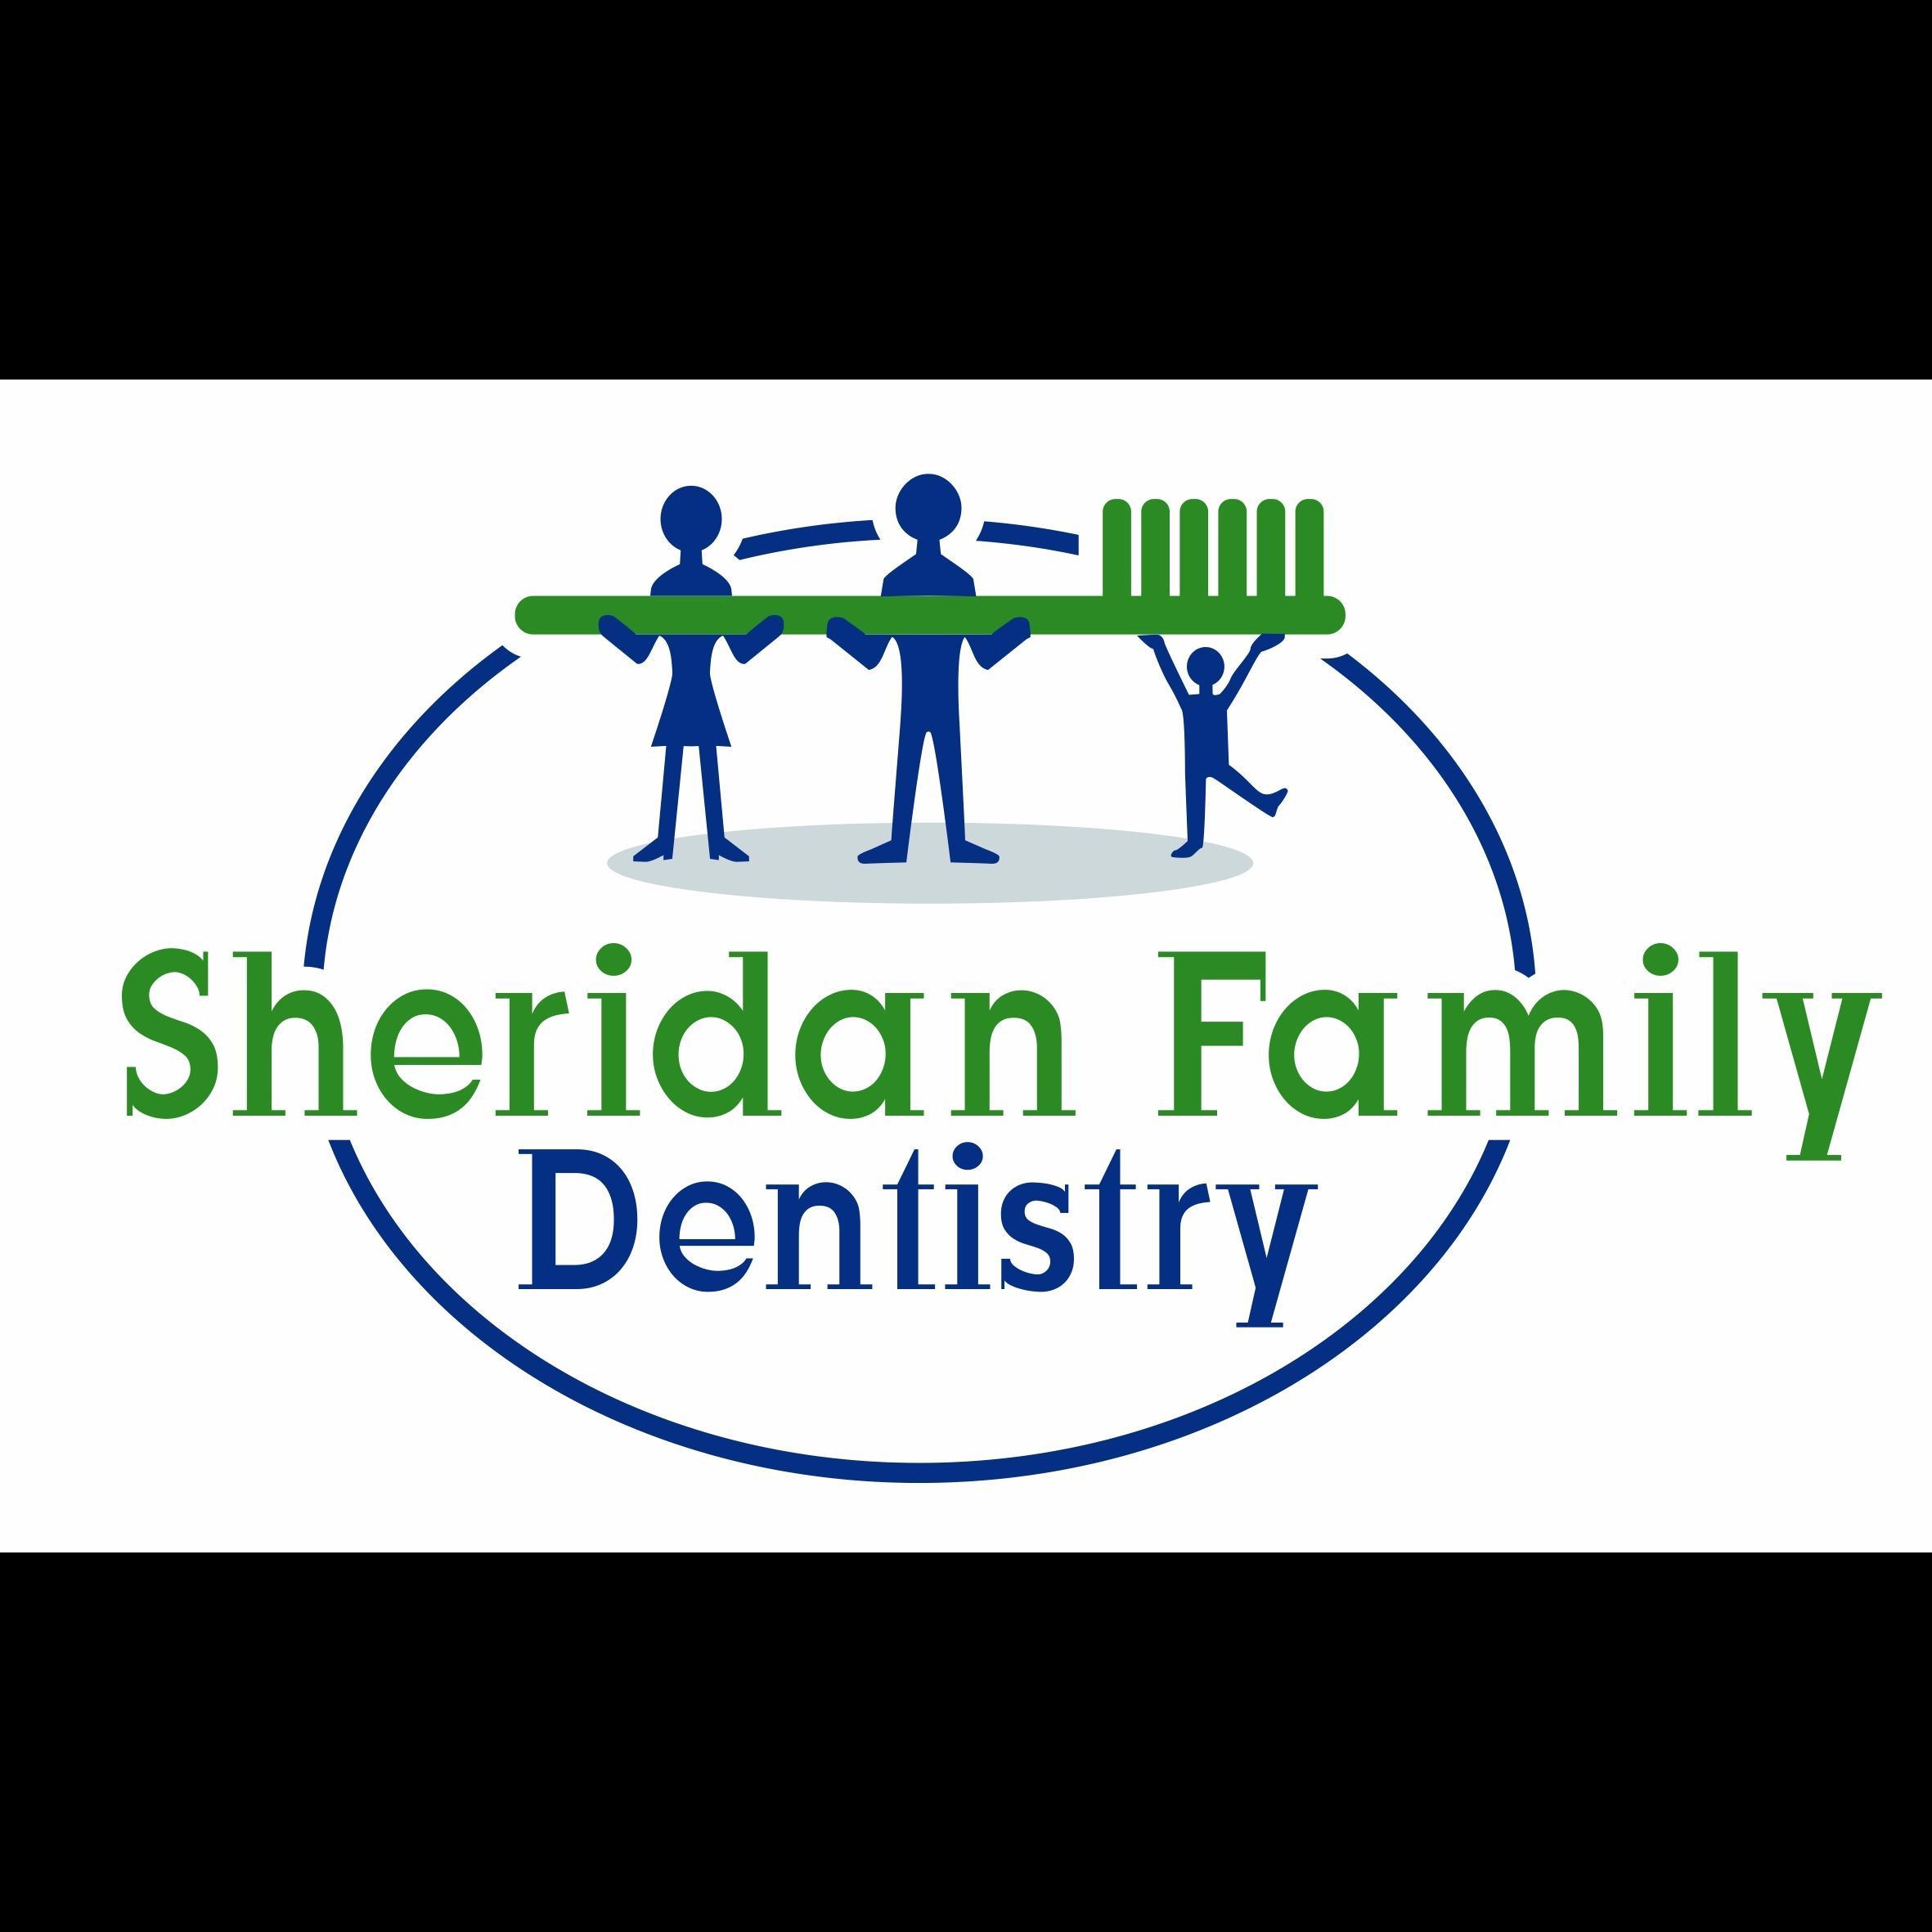 Sheridan Family Dentistry